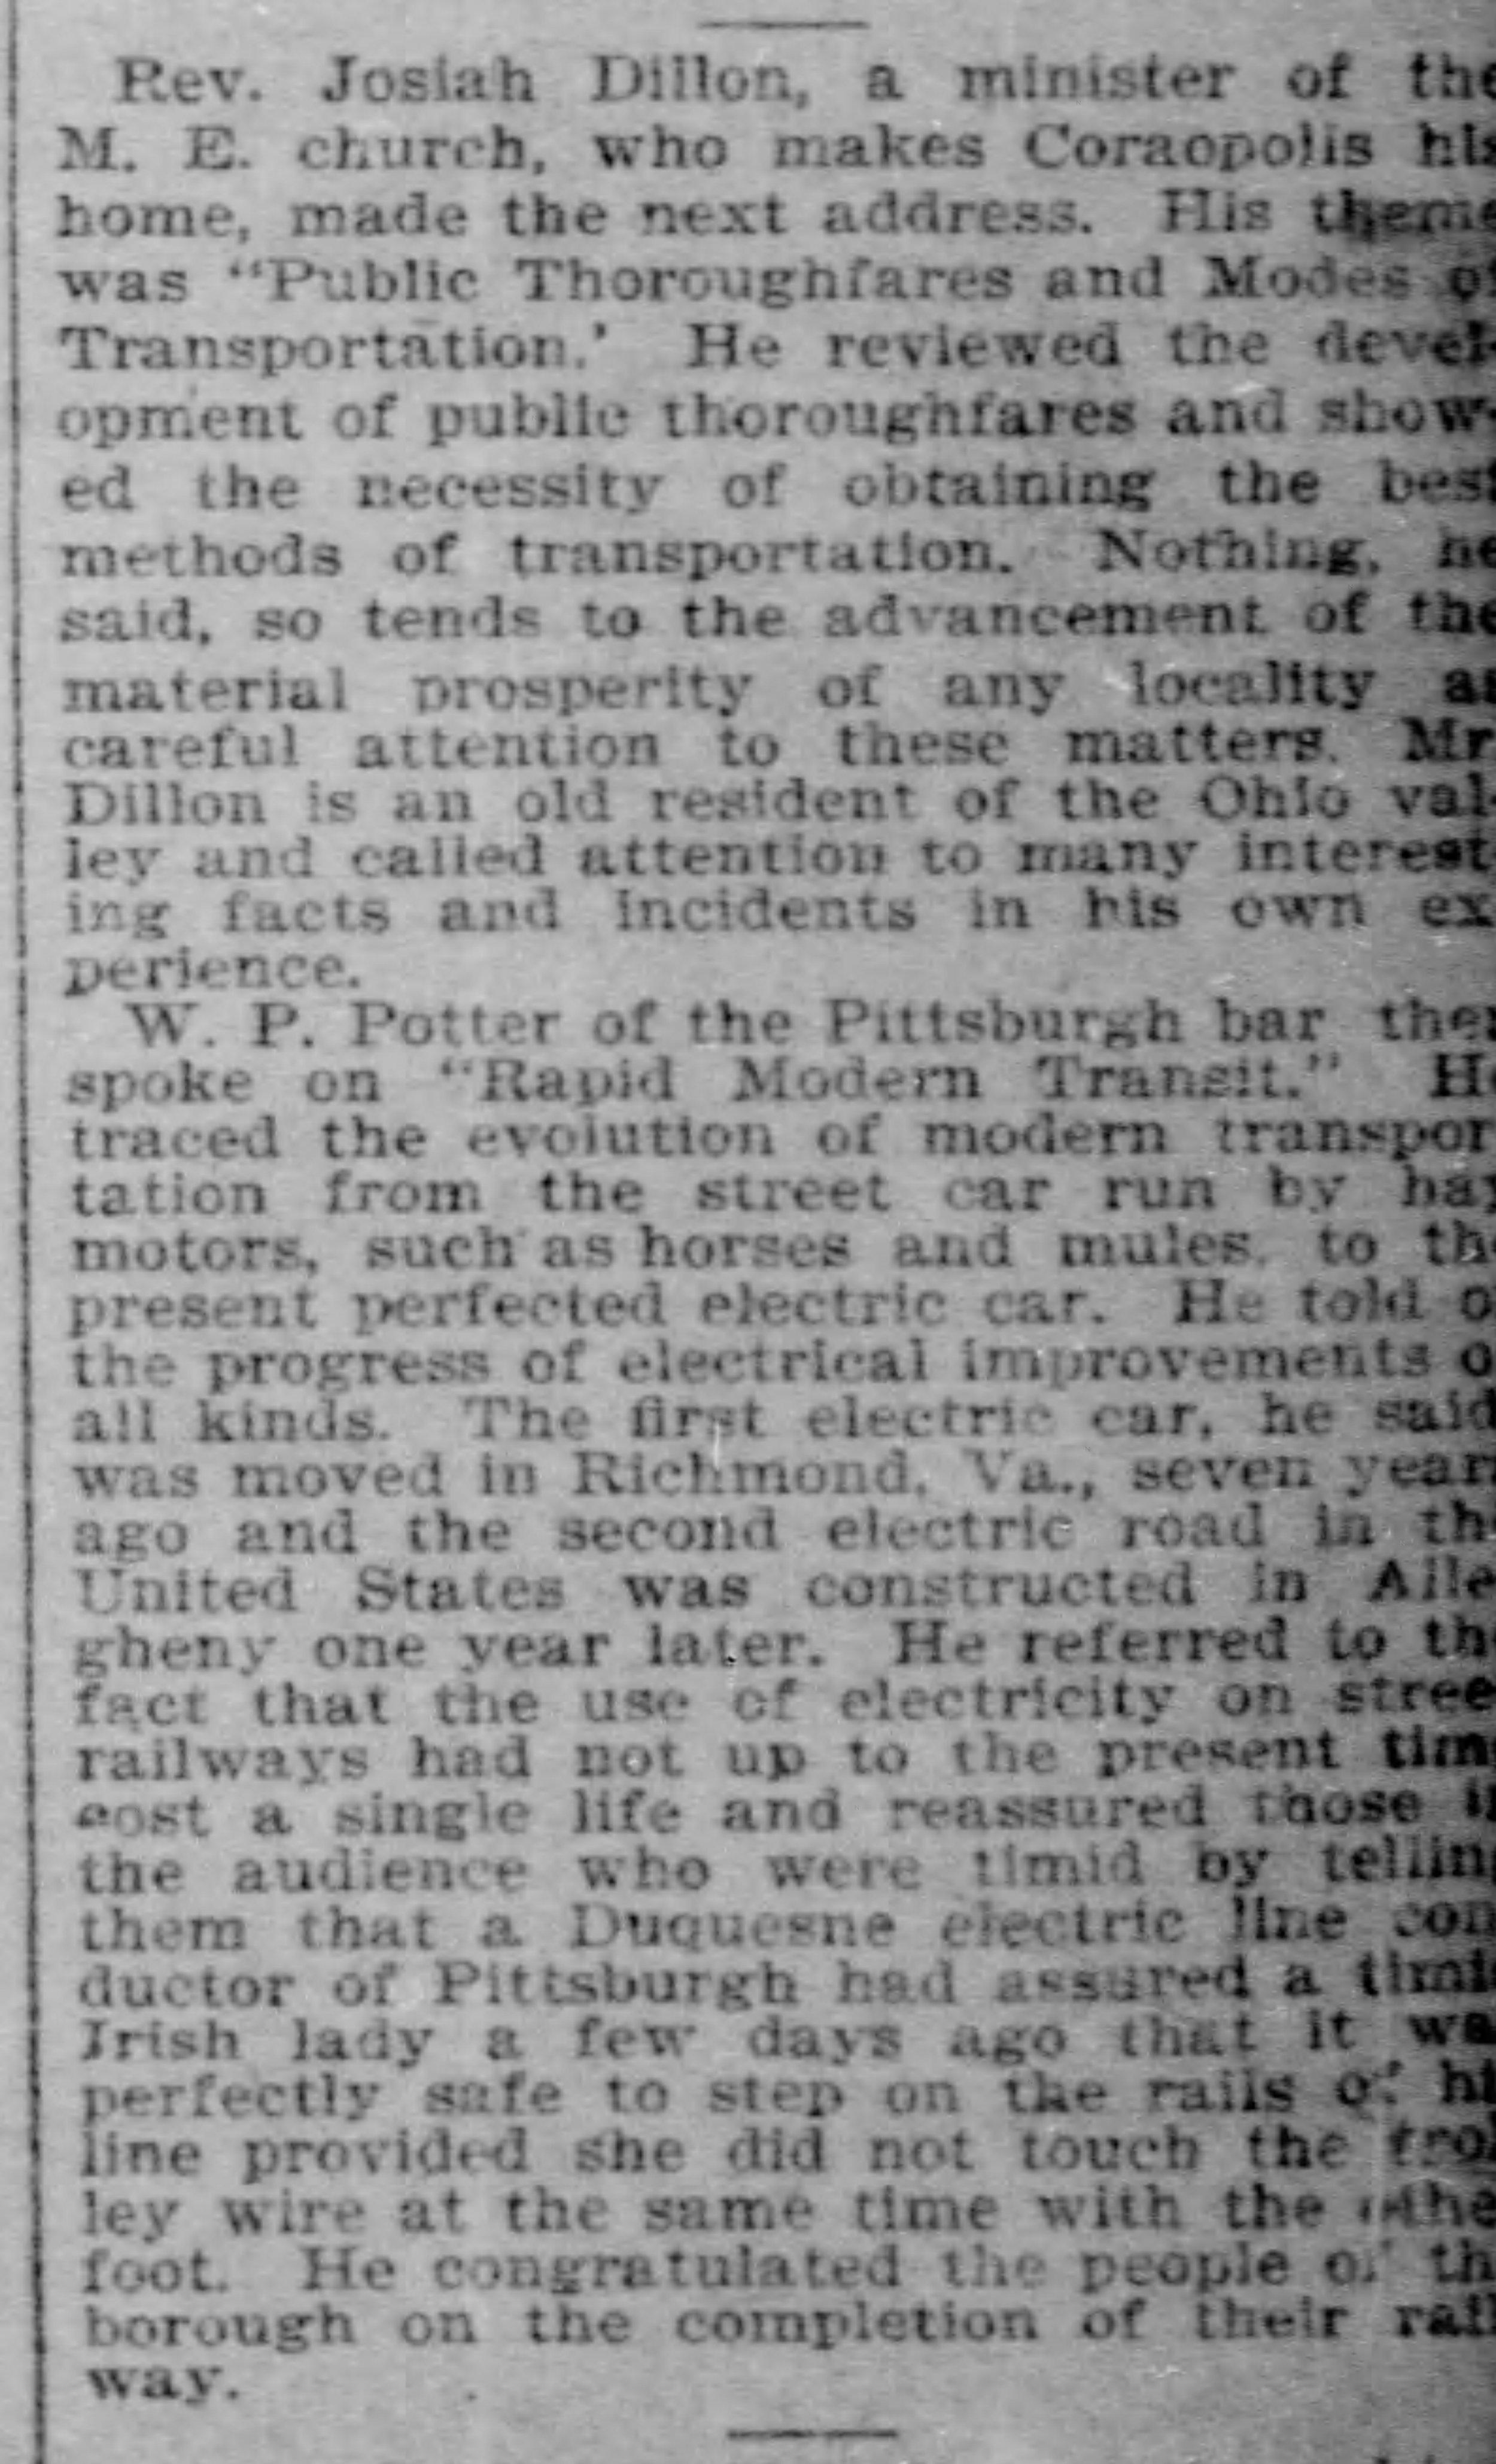 Pittsburgh Post Gazette, July 27, 1894